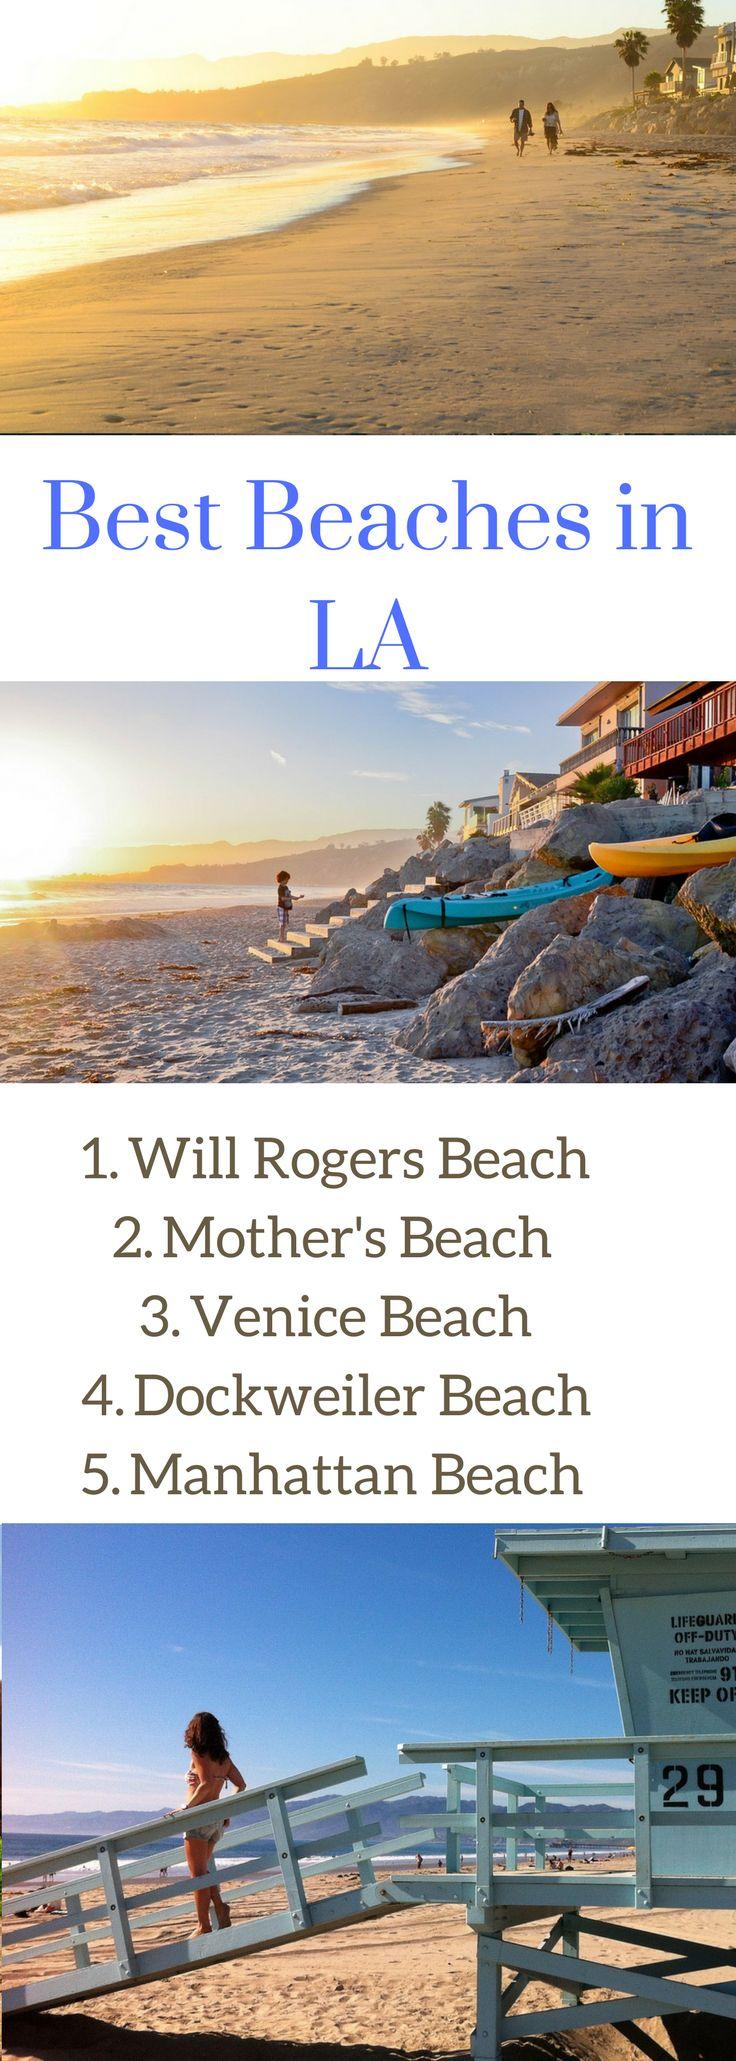 Best beaches in LA | Beaches in Los Angeles | Los Angeles Beaches | Santa Monica Beaches | Venice Beach | Dockweiler Beach | Hermosa Beach | Manhattan Beach